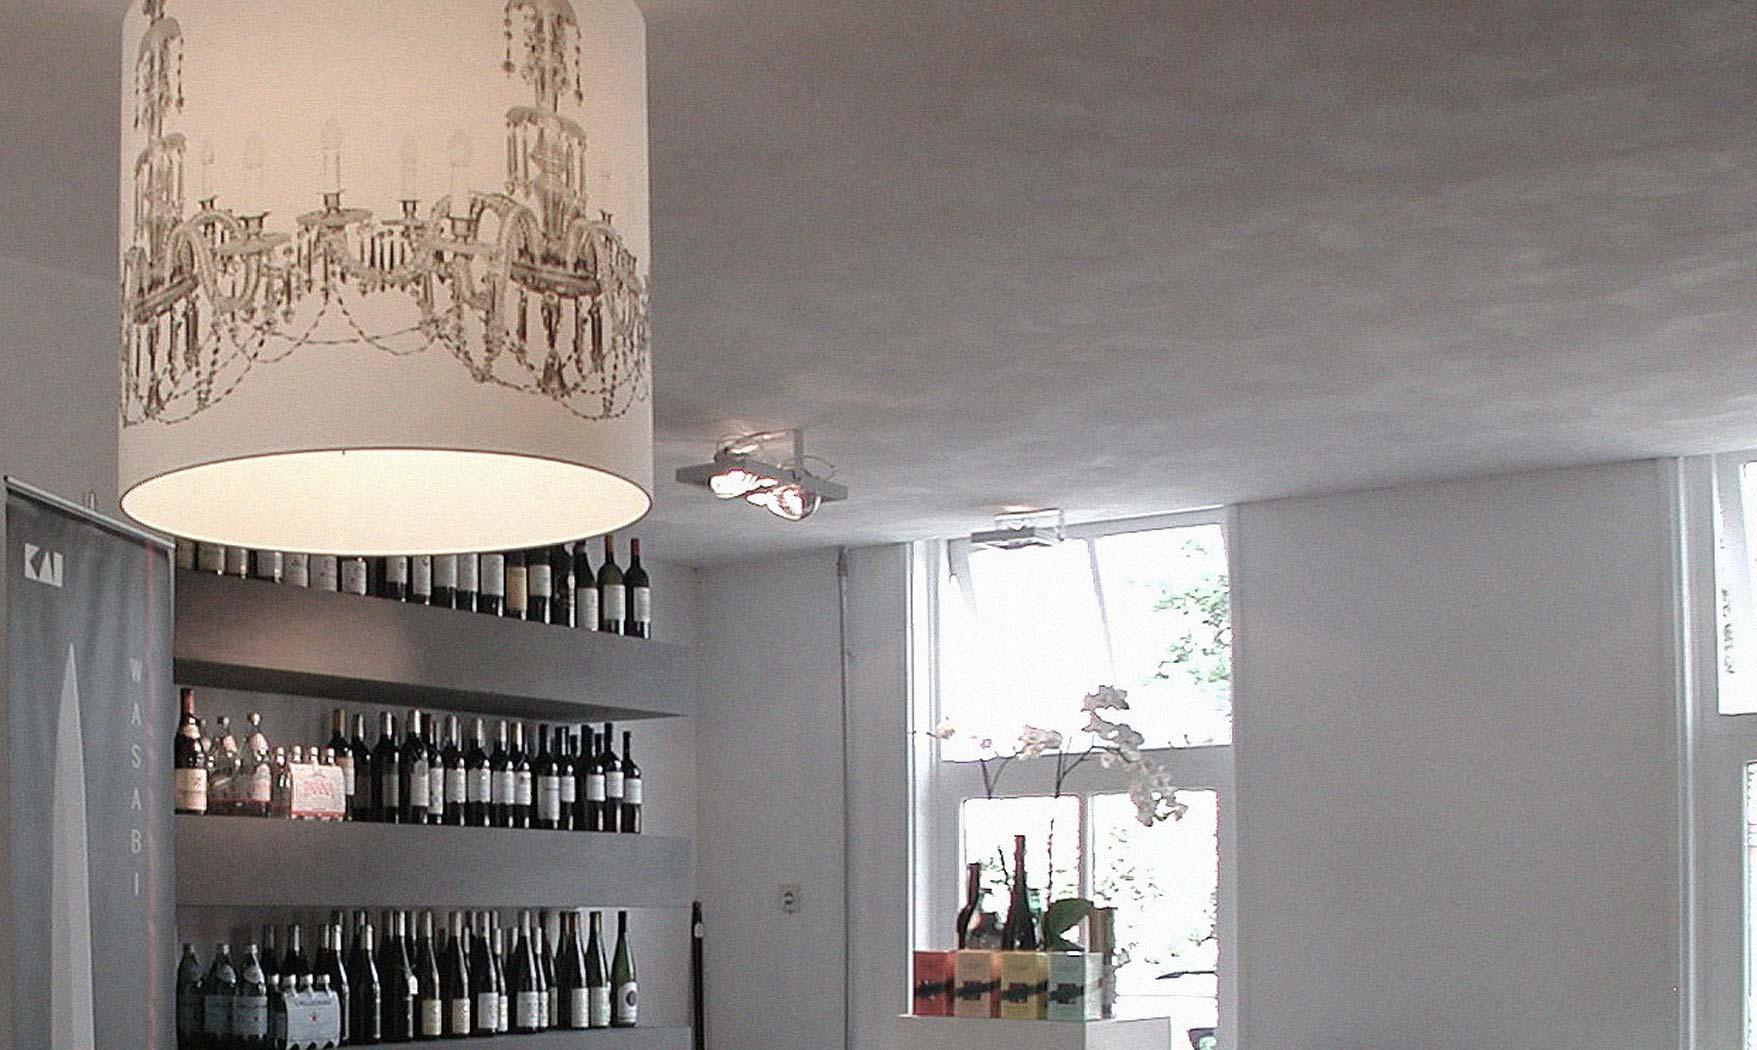 Interieur Inrichting Galerie : Interieur architectuur projects conceptcie door samenwerking